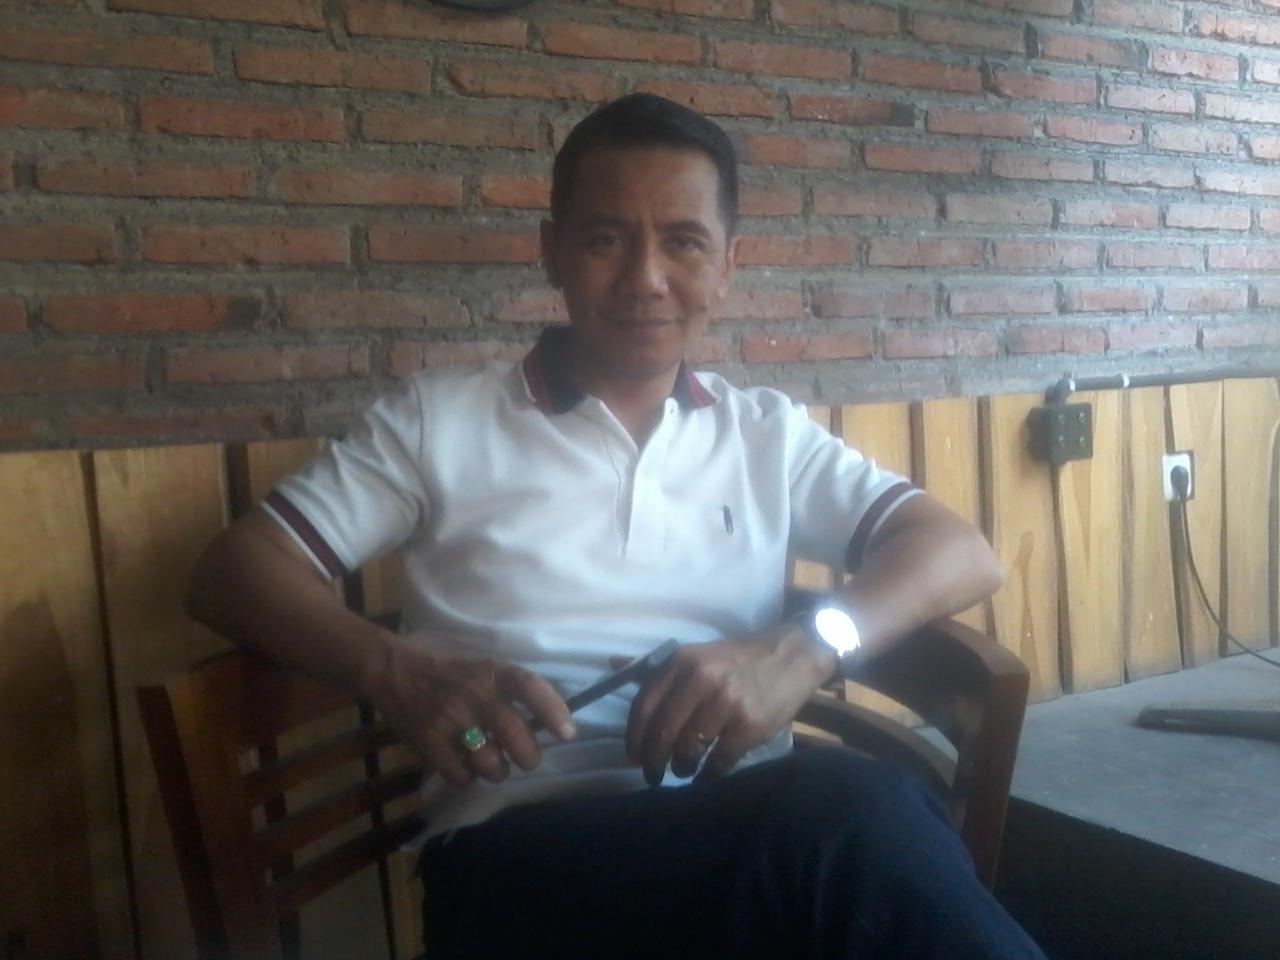 Santer Kabar Pemilik Pabrik King Beton Dimintai Maaf Oleh  3 Orang Perwakilan PT. MRS